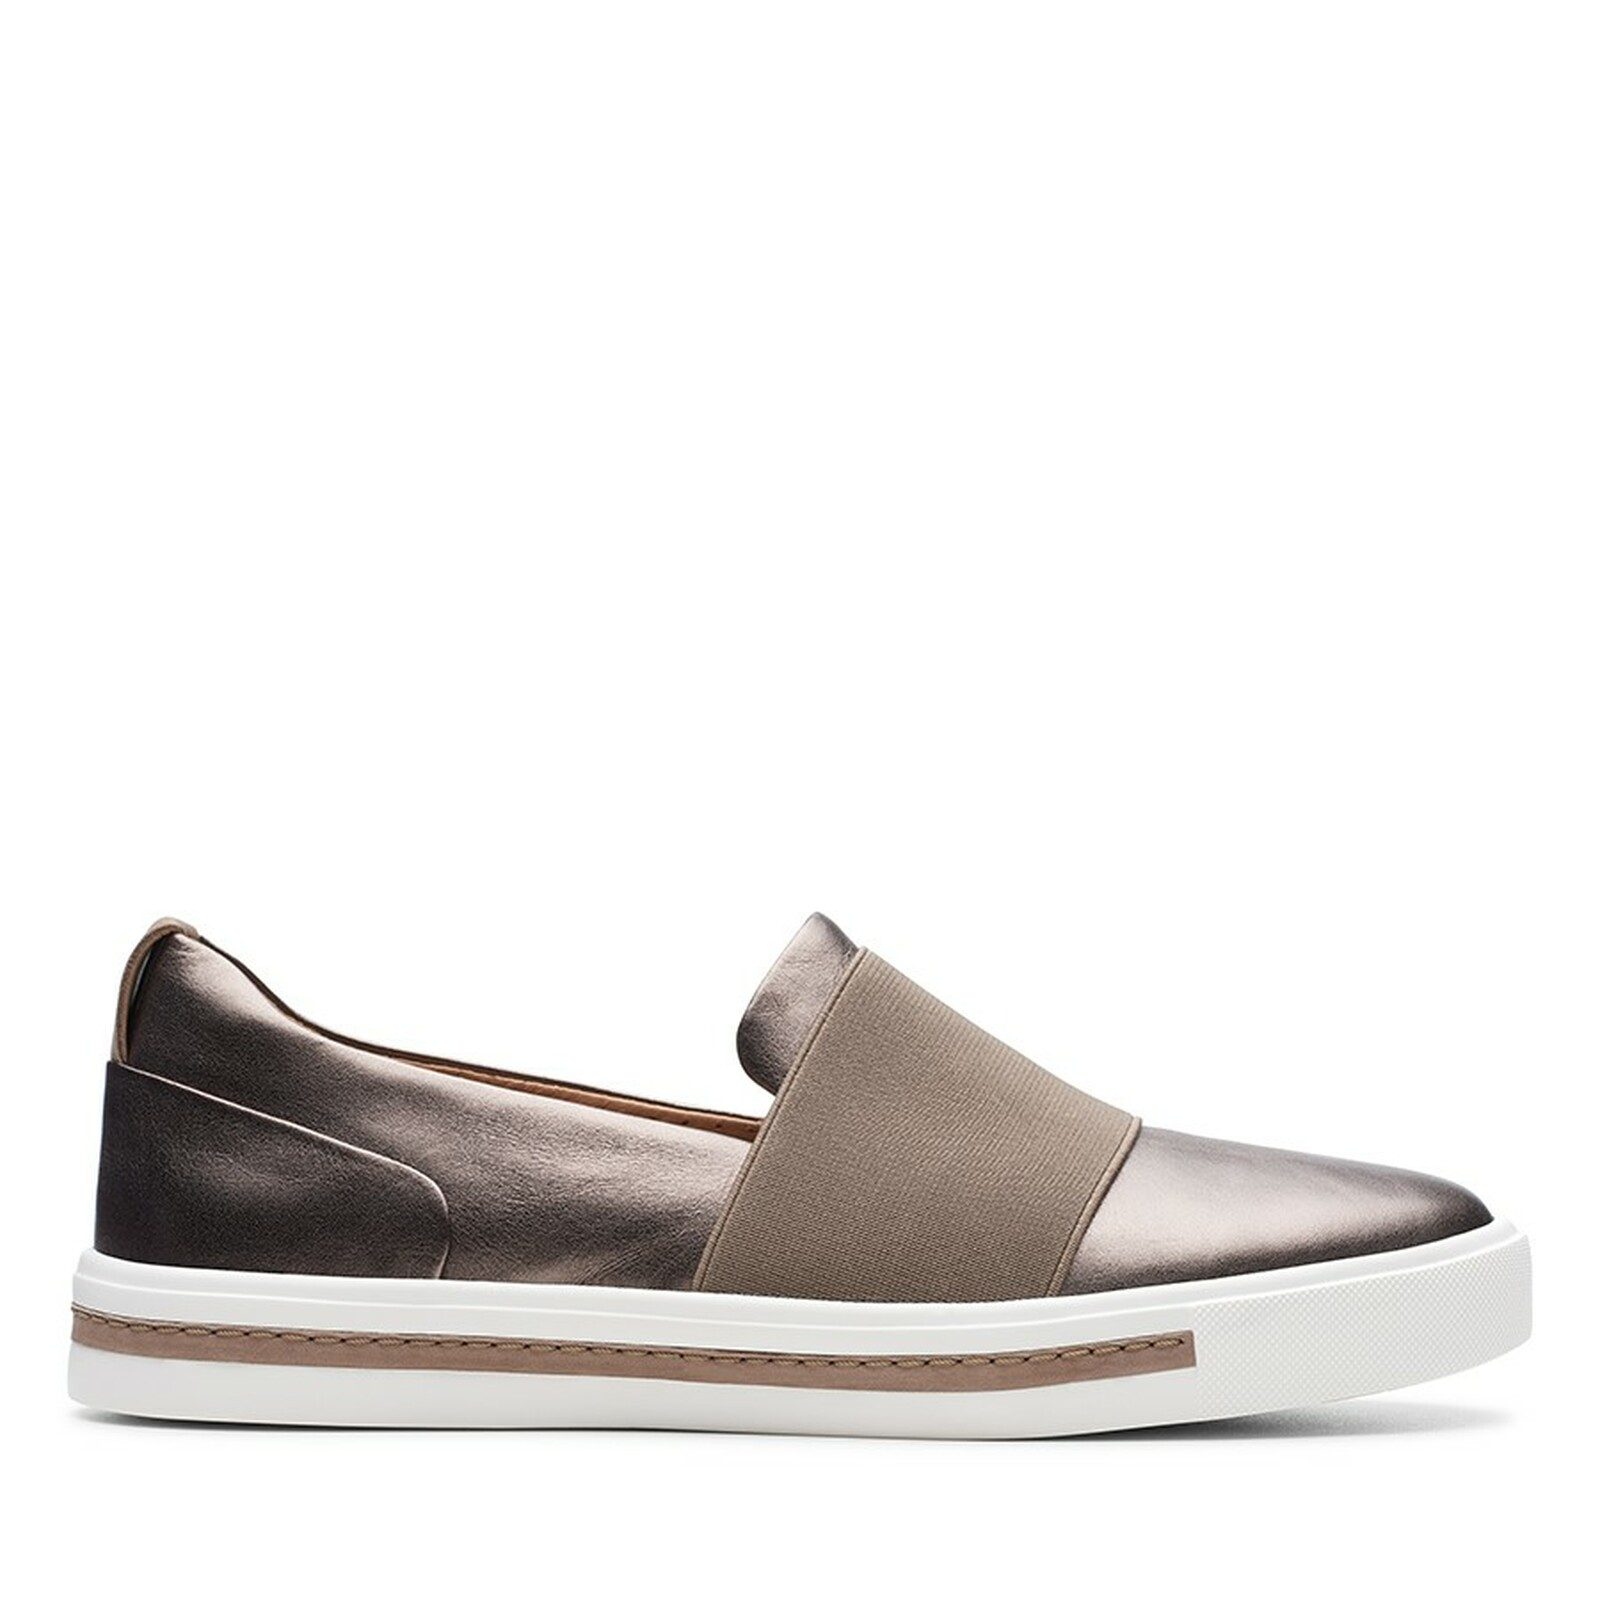 Clarks Womens UN MAUI STEP Pebble Metallic Leather